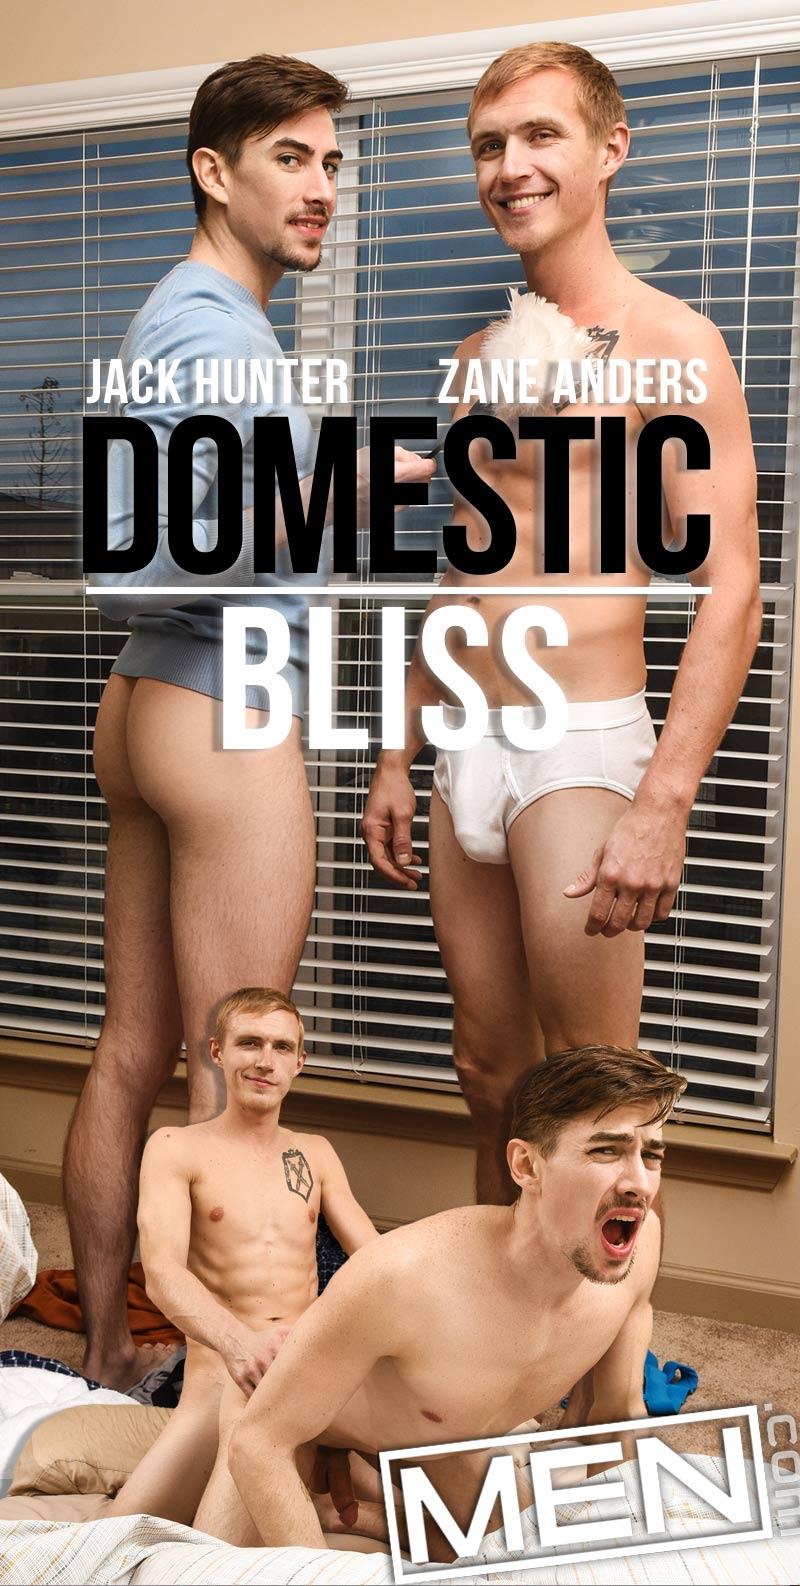 Domestic Bliss (Zane Anders and Jack Hunter Flip-Fuck) at MEN.com